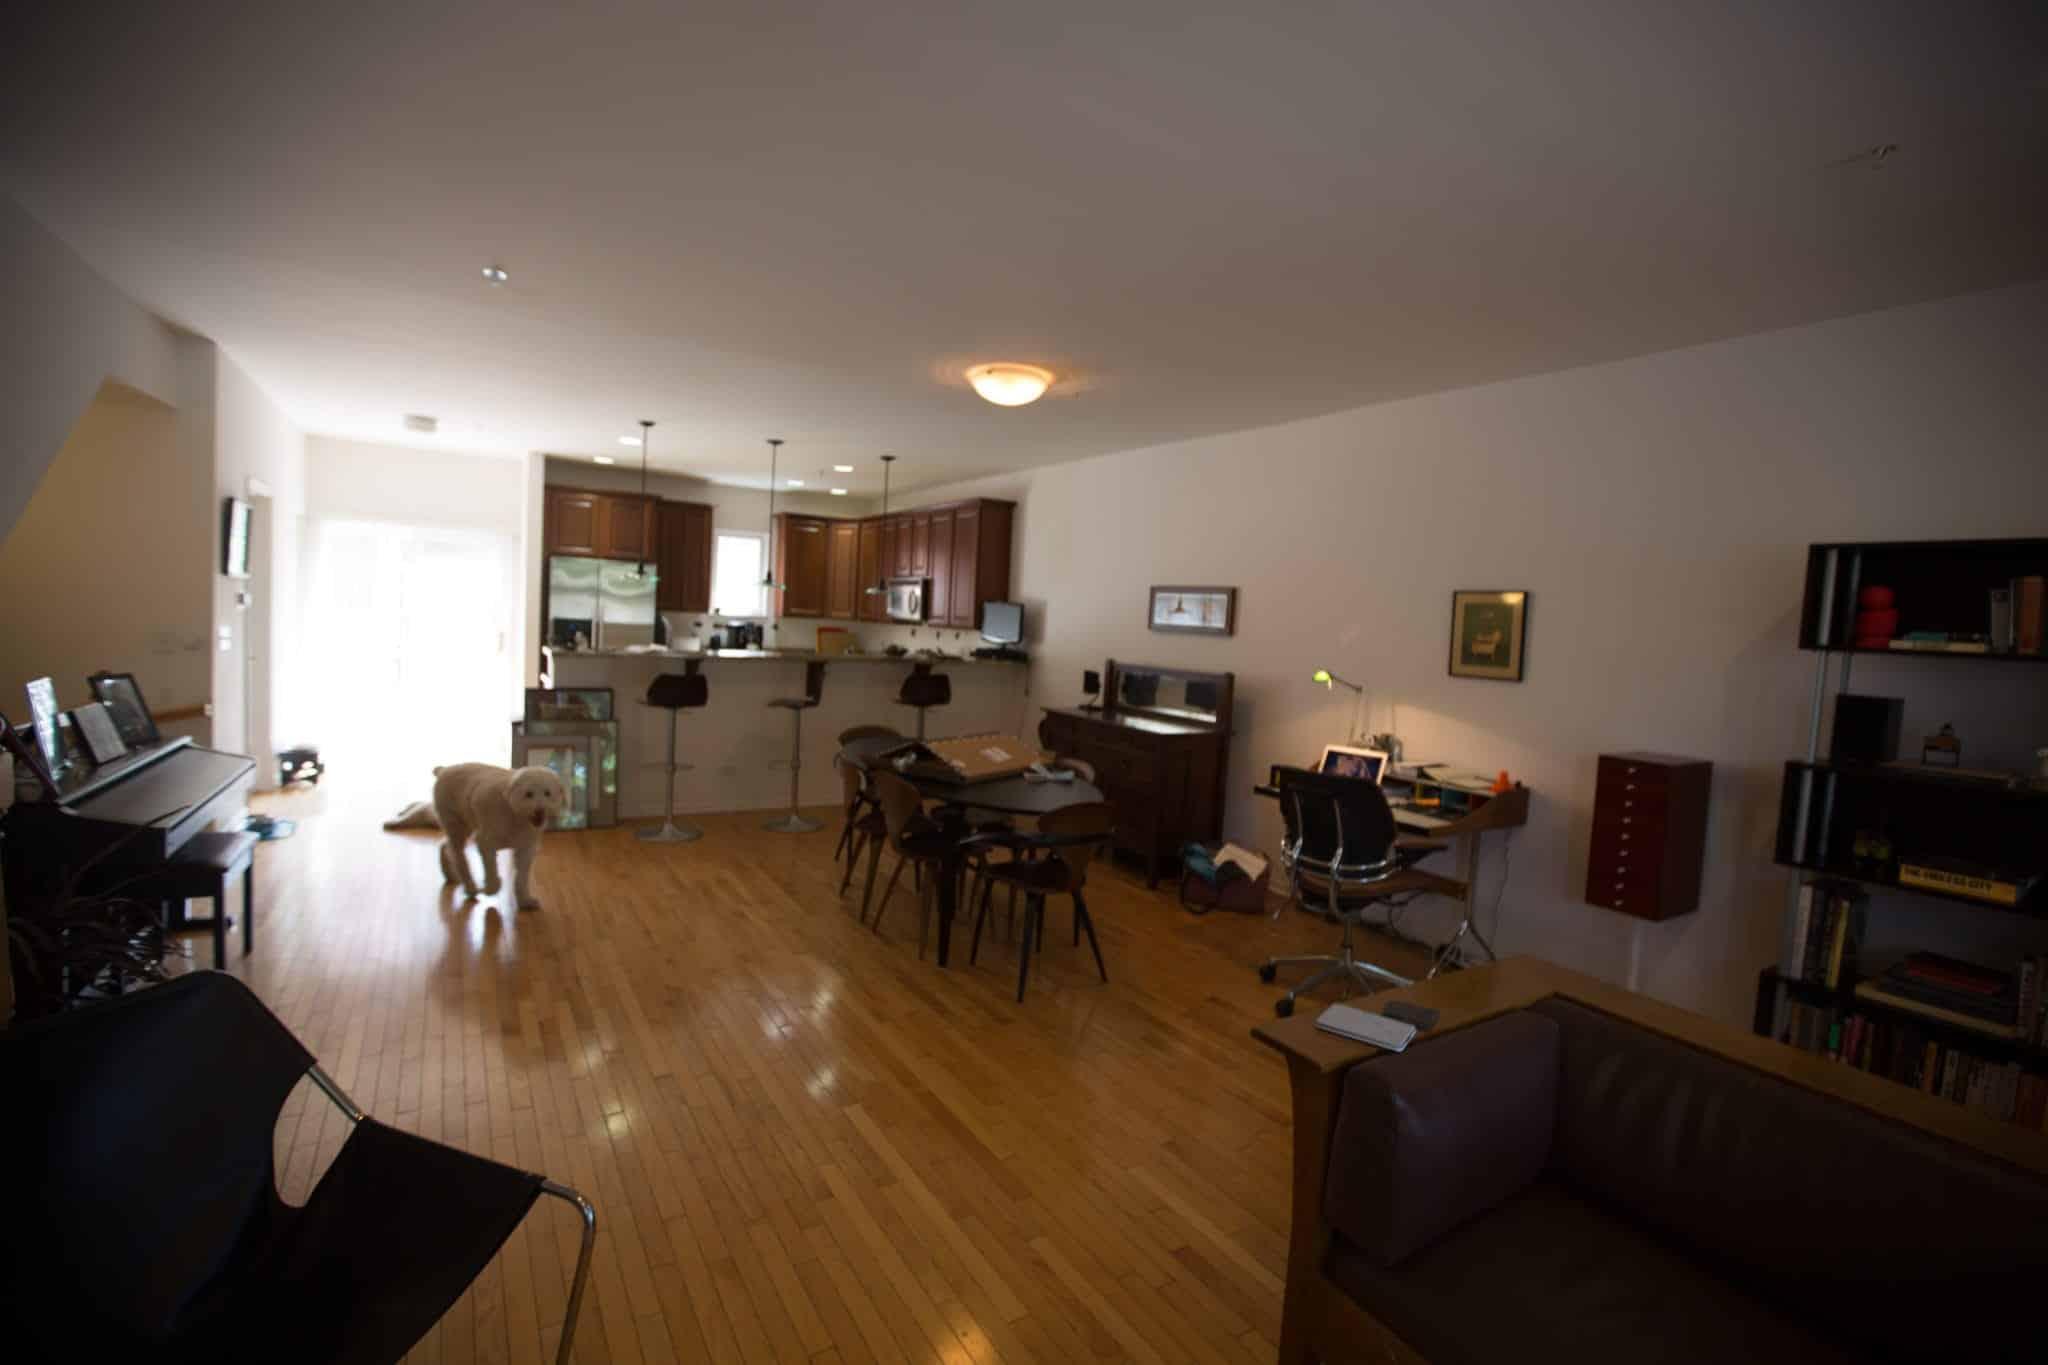 Evanston Interior Design Project, Before